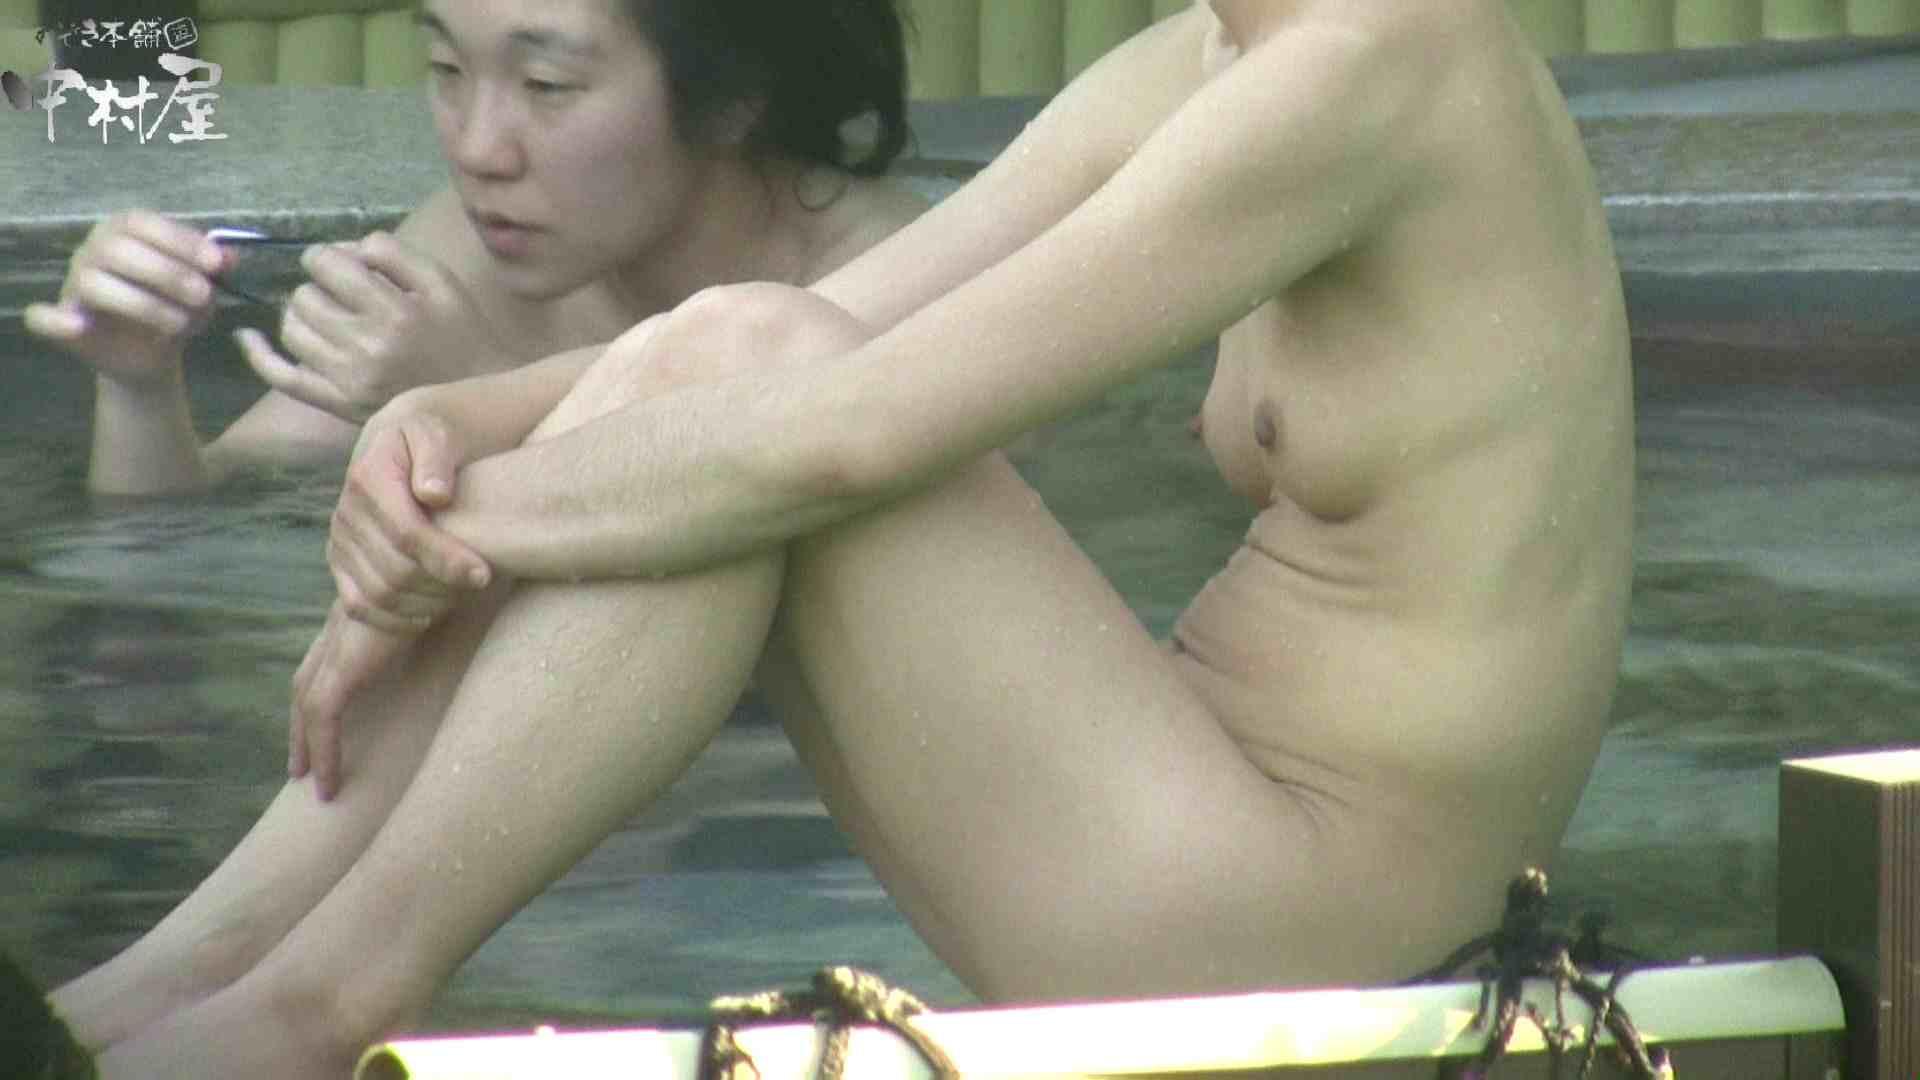 Aquaな露天風呂Vol.970 盗撮特撮 オメコ動画キャプチャ 13pic 11